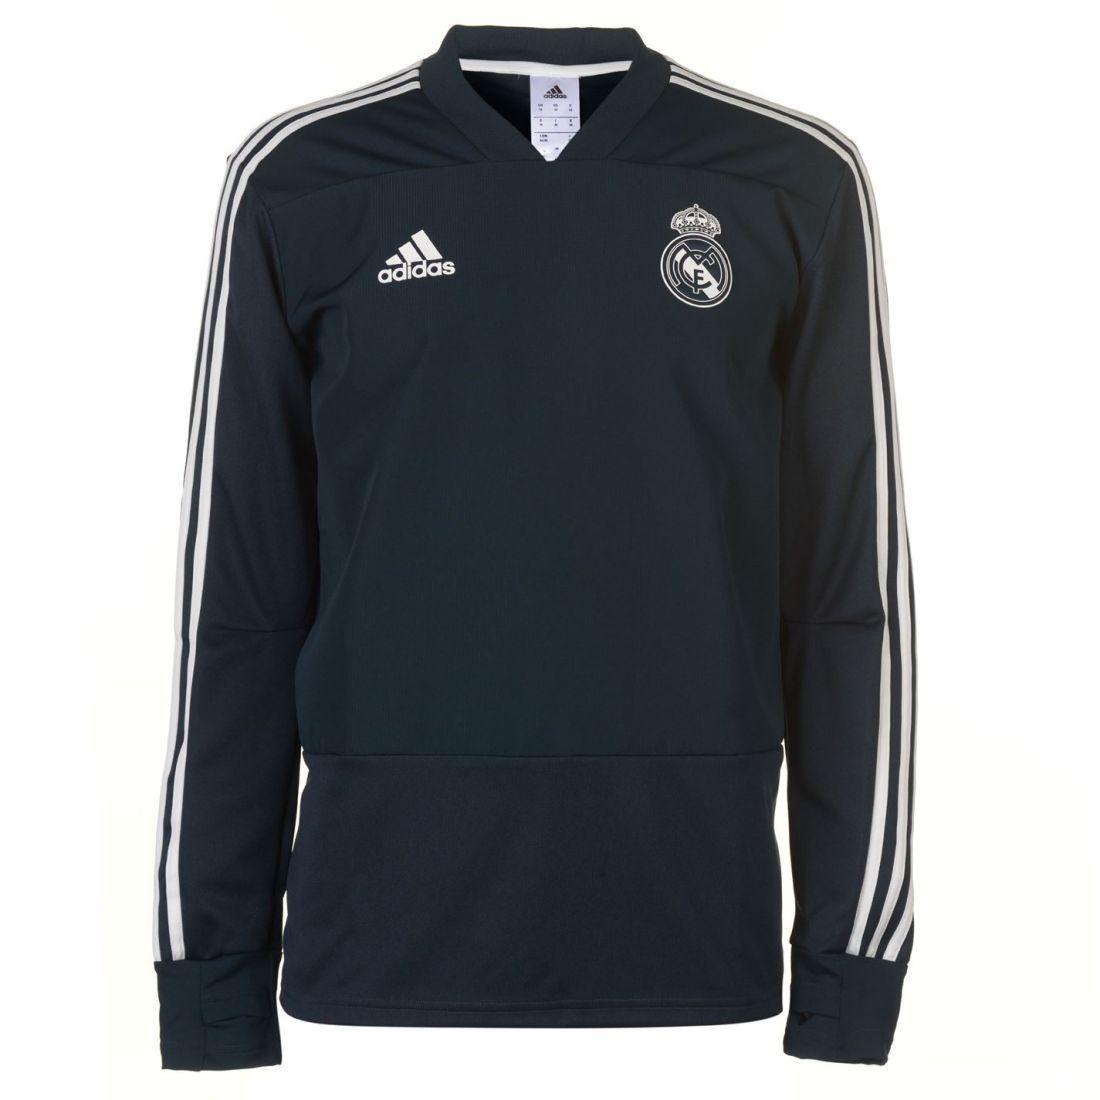 adidas Mens Real Madrid CF Training Top Long Sleeve Performance Shirt V 7b78d8d54